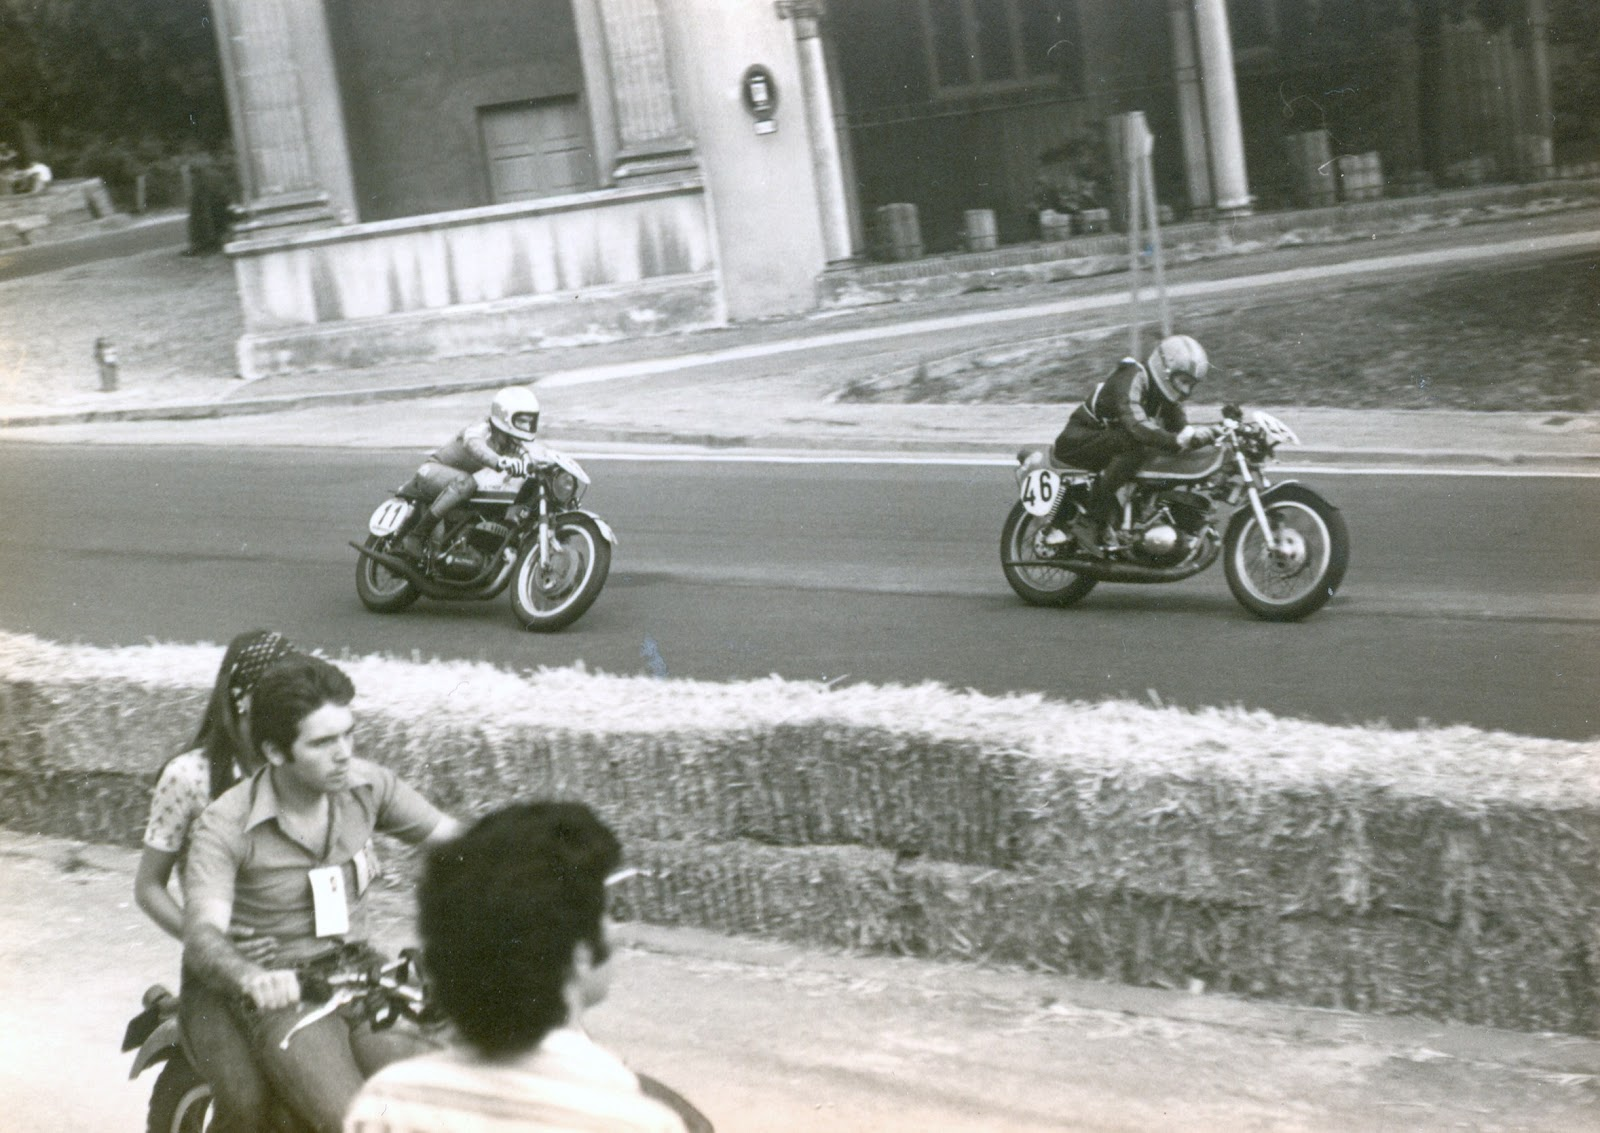 Réplica Bultaco 24H Alguersuari-De Juan Carol+E-1973-24H+Montju%C3%AFc-Montesa-Jaime+Barrig%C3%A1